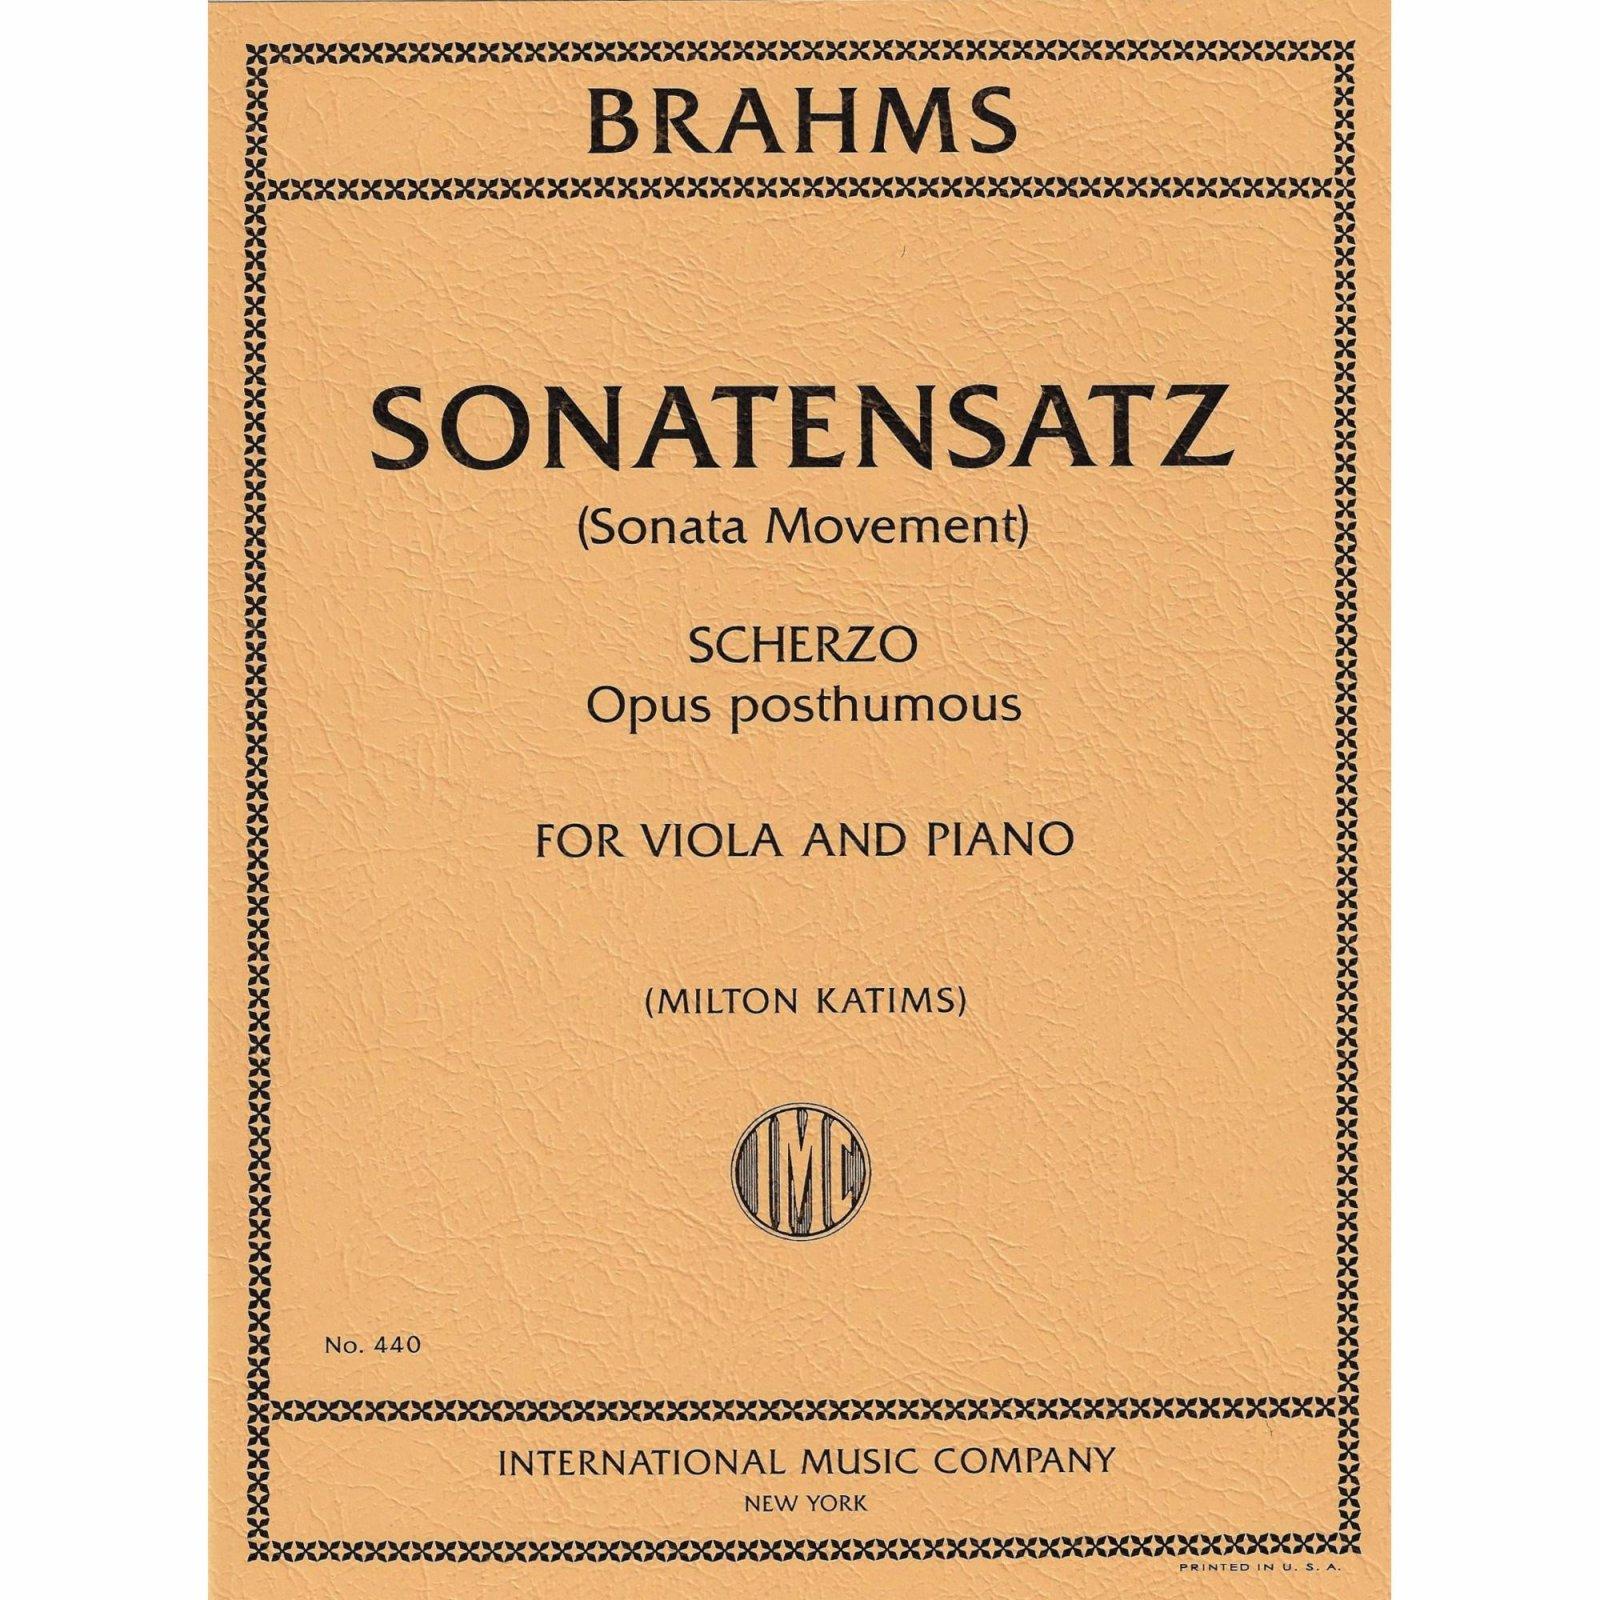 Brahms: Sonatensatz Ed. Katims